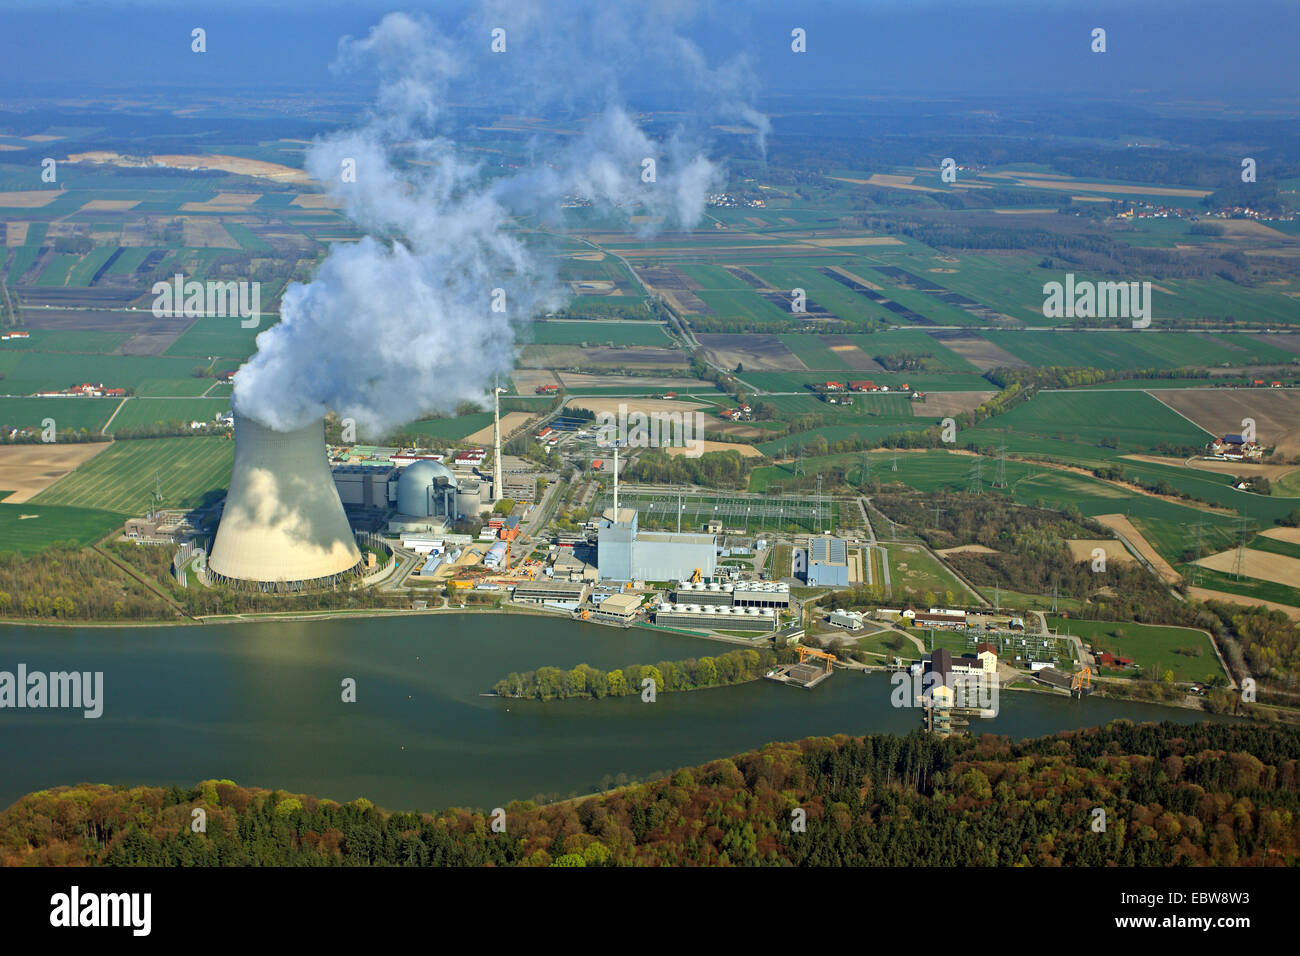 nuclear power station Isar 2, Germany, Bavaria, Niederbayern, Lower Bavaria - Stock Image